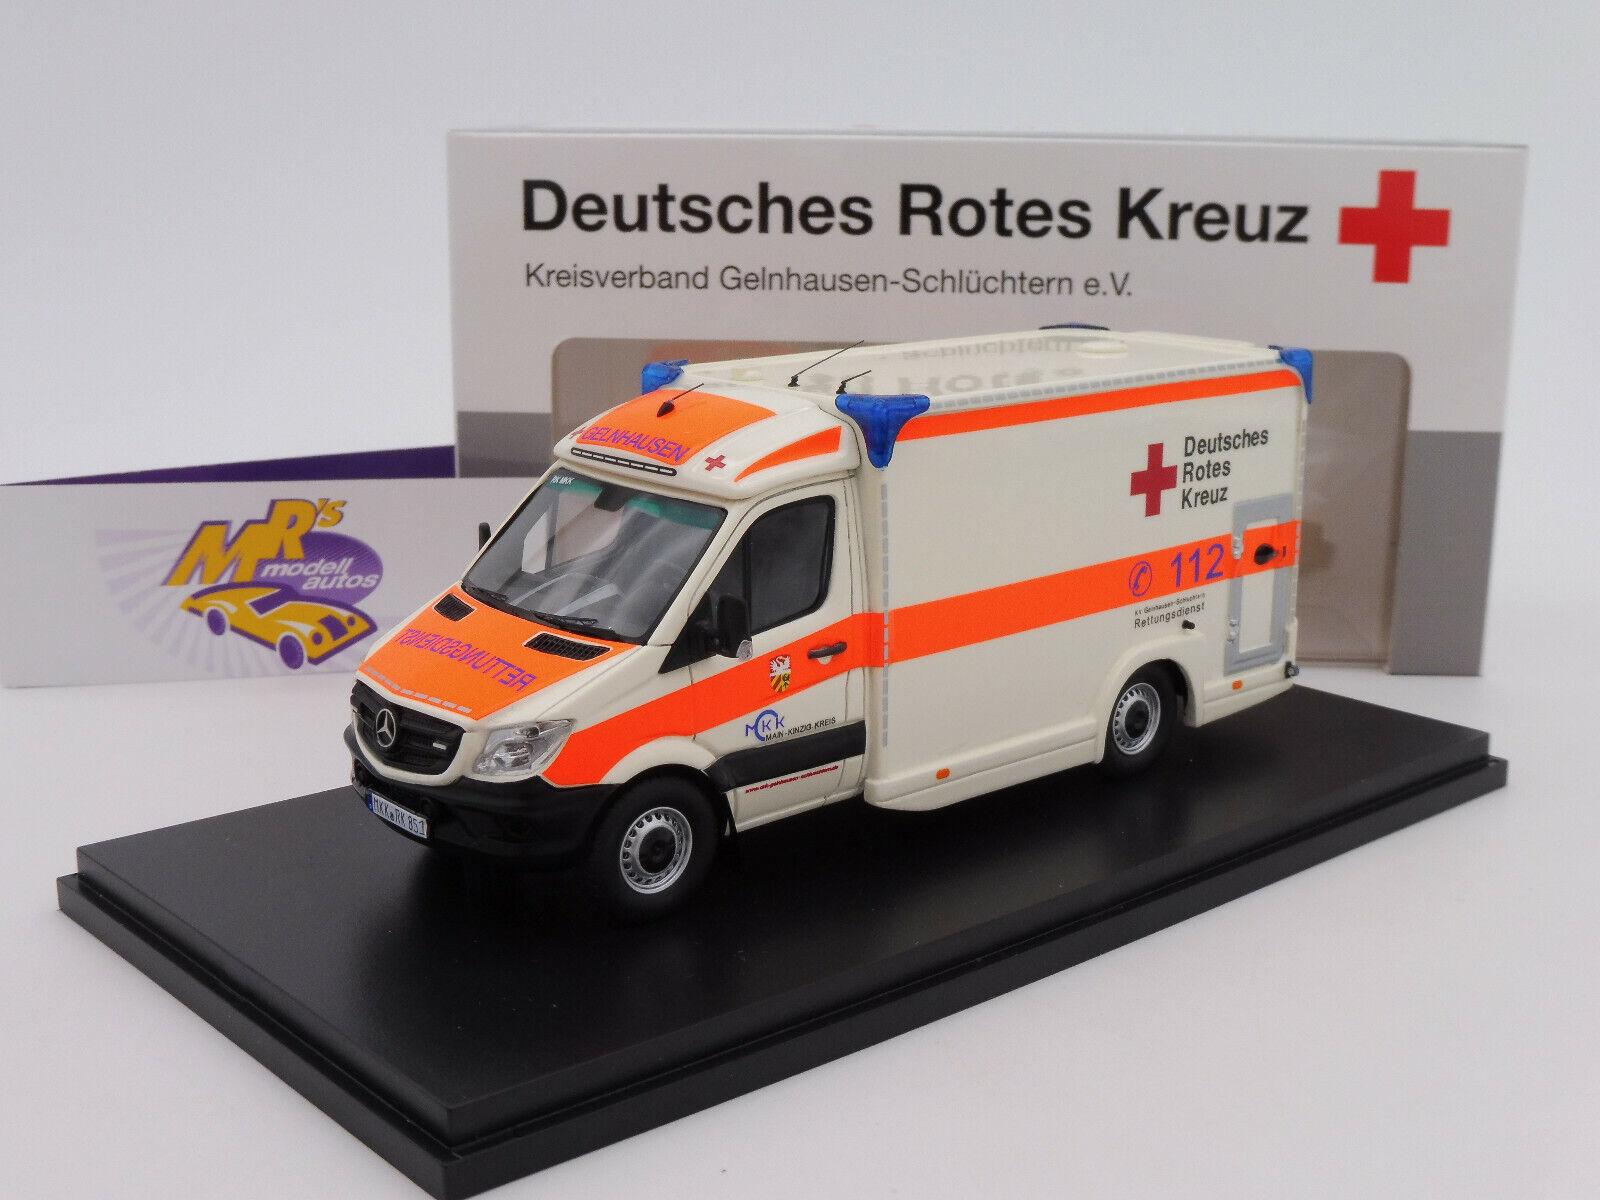 100% precio garantizado Matriz 41302-211     Mercedes Sprinter 319 CDI camión de rescate rdc Gelnhausen 1 43  en venta en línea